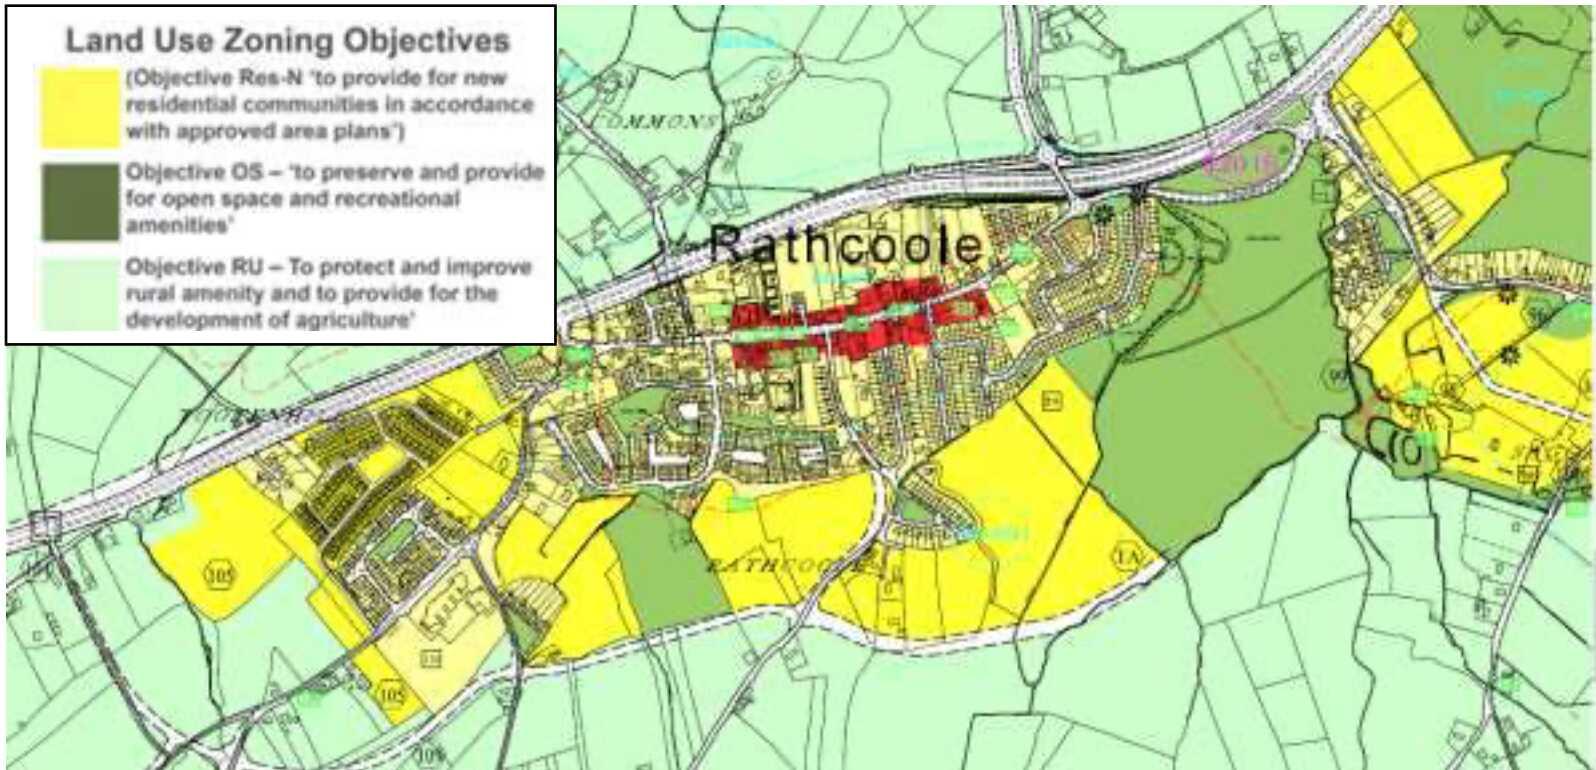 Rathcoole Draft Master Plan Series – County Development Plan – April 2020